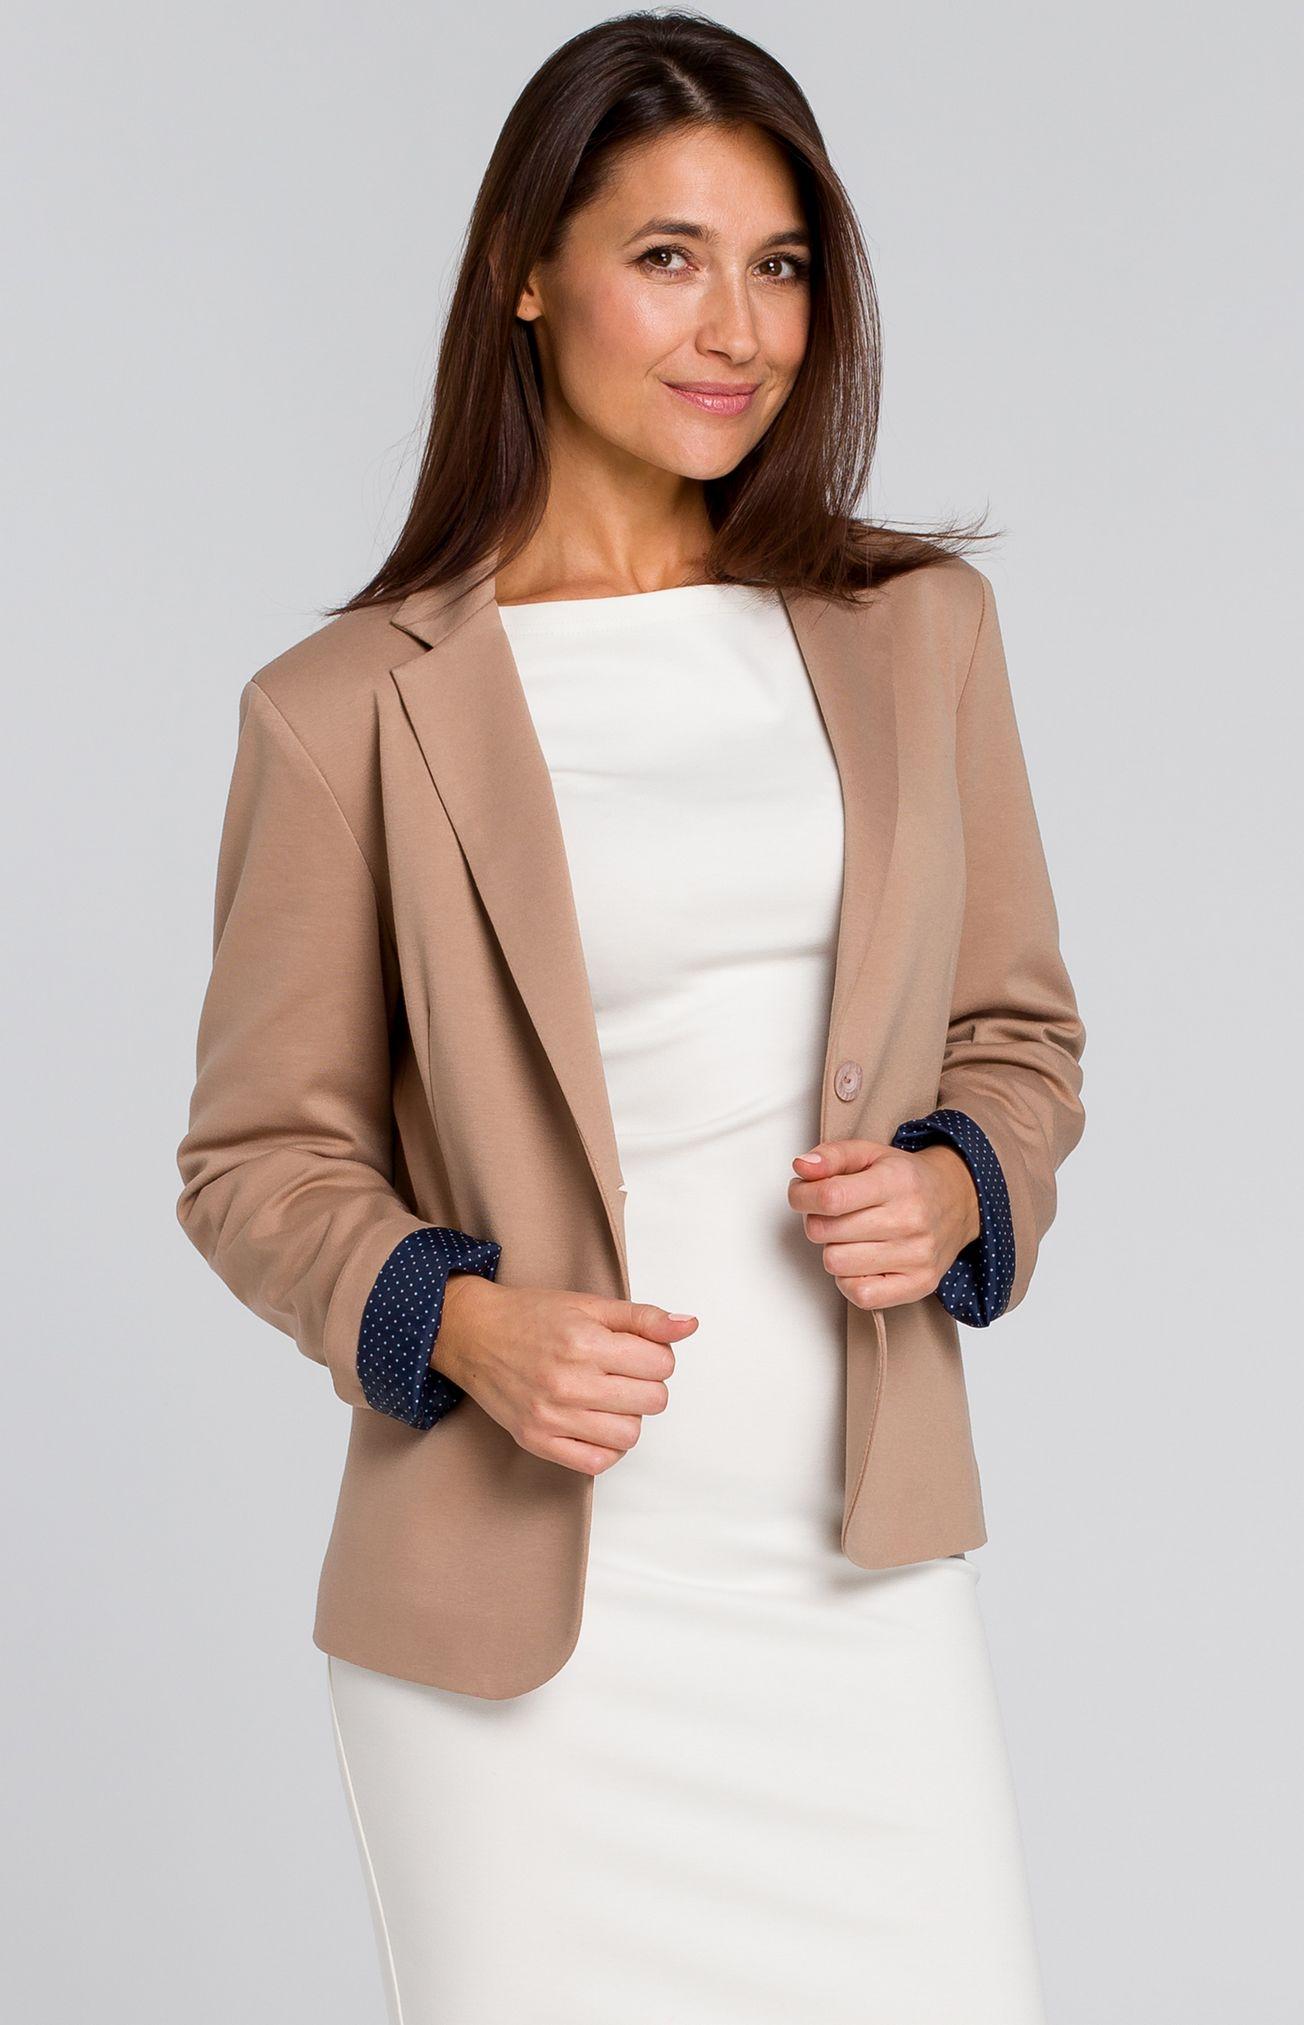 f51d78be99b Veste blazer 1 bouton beige Style S154BE   idresstocode  boutique de ...